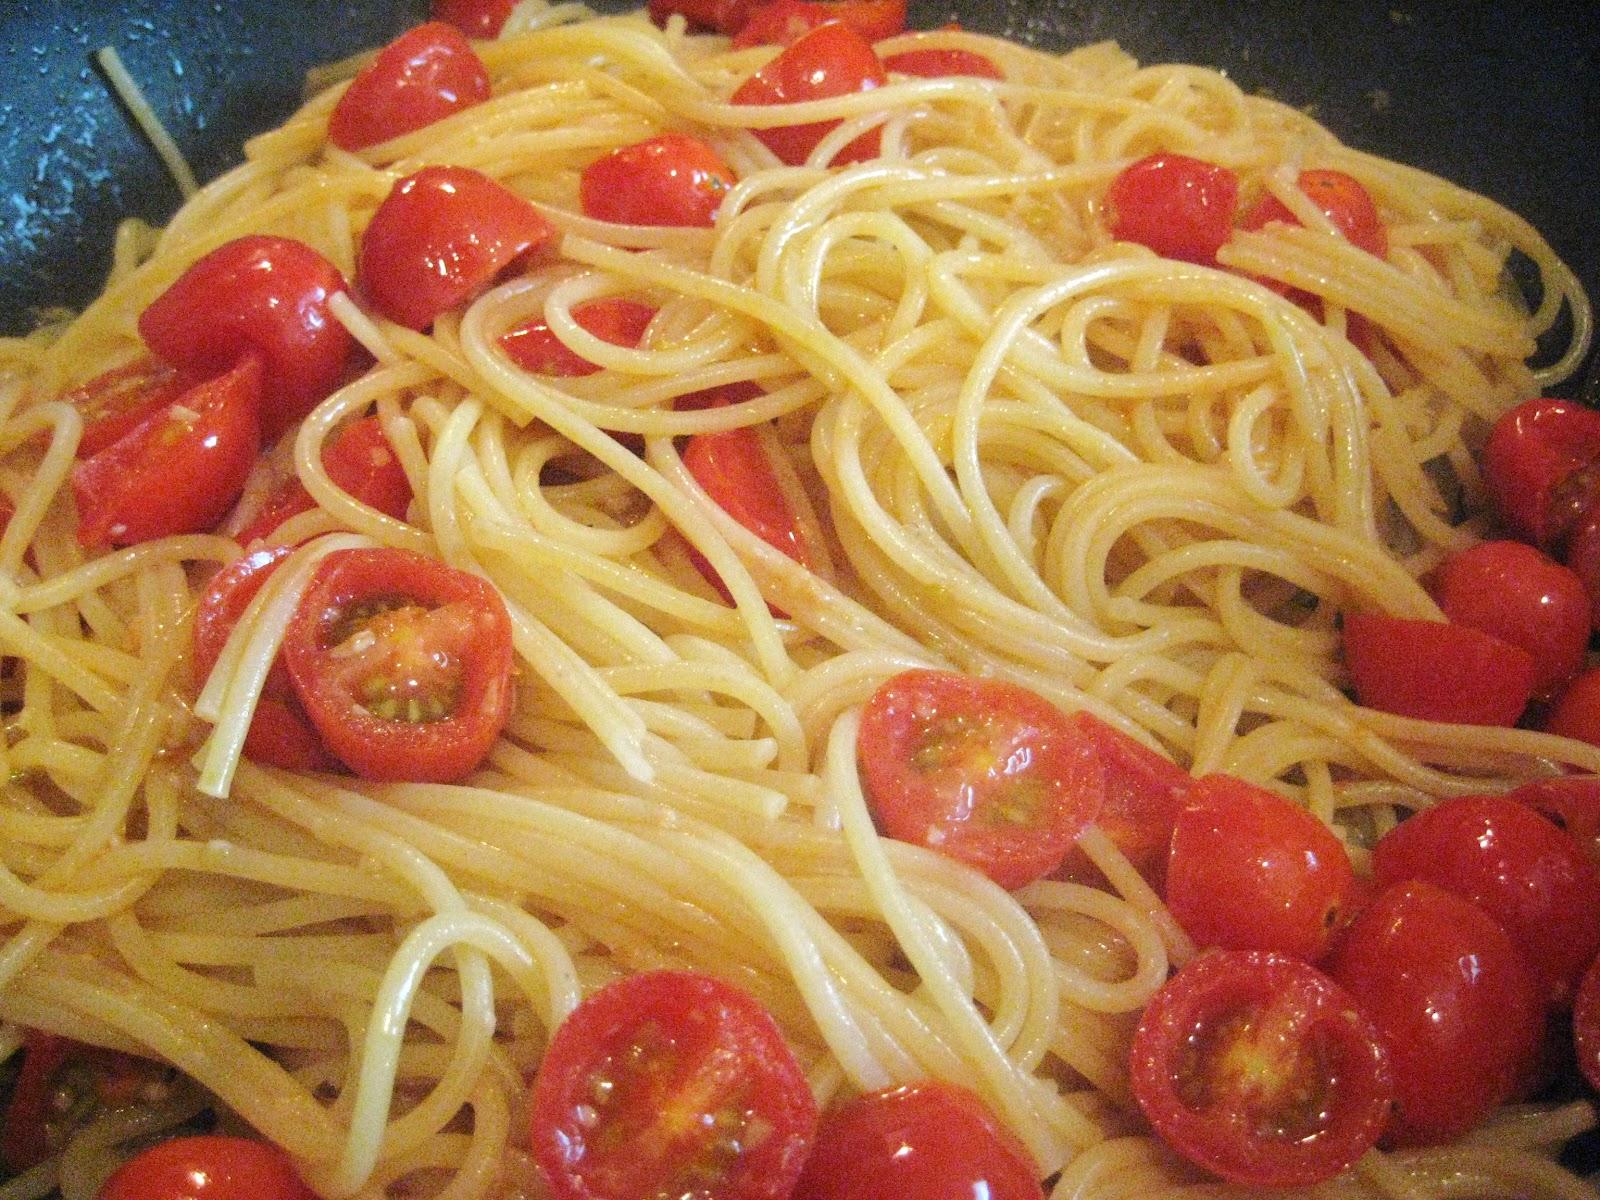 Britt's Apron: Sauteed Basil and Grape Tomato Spaghetti